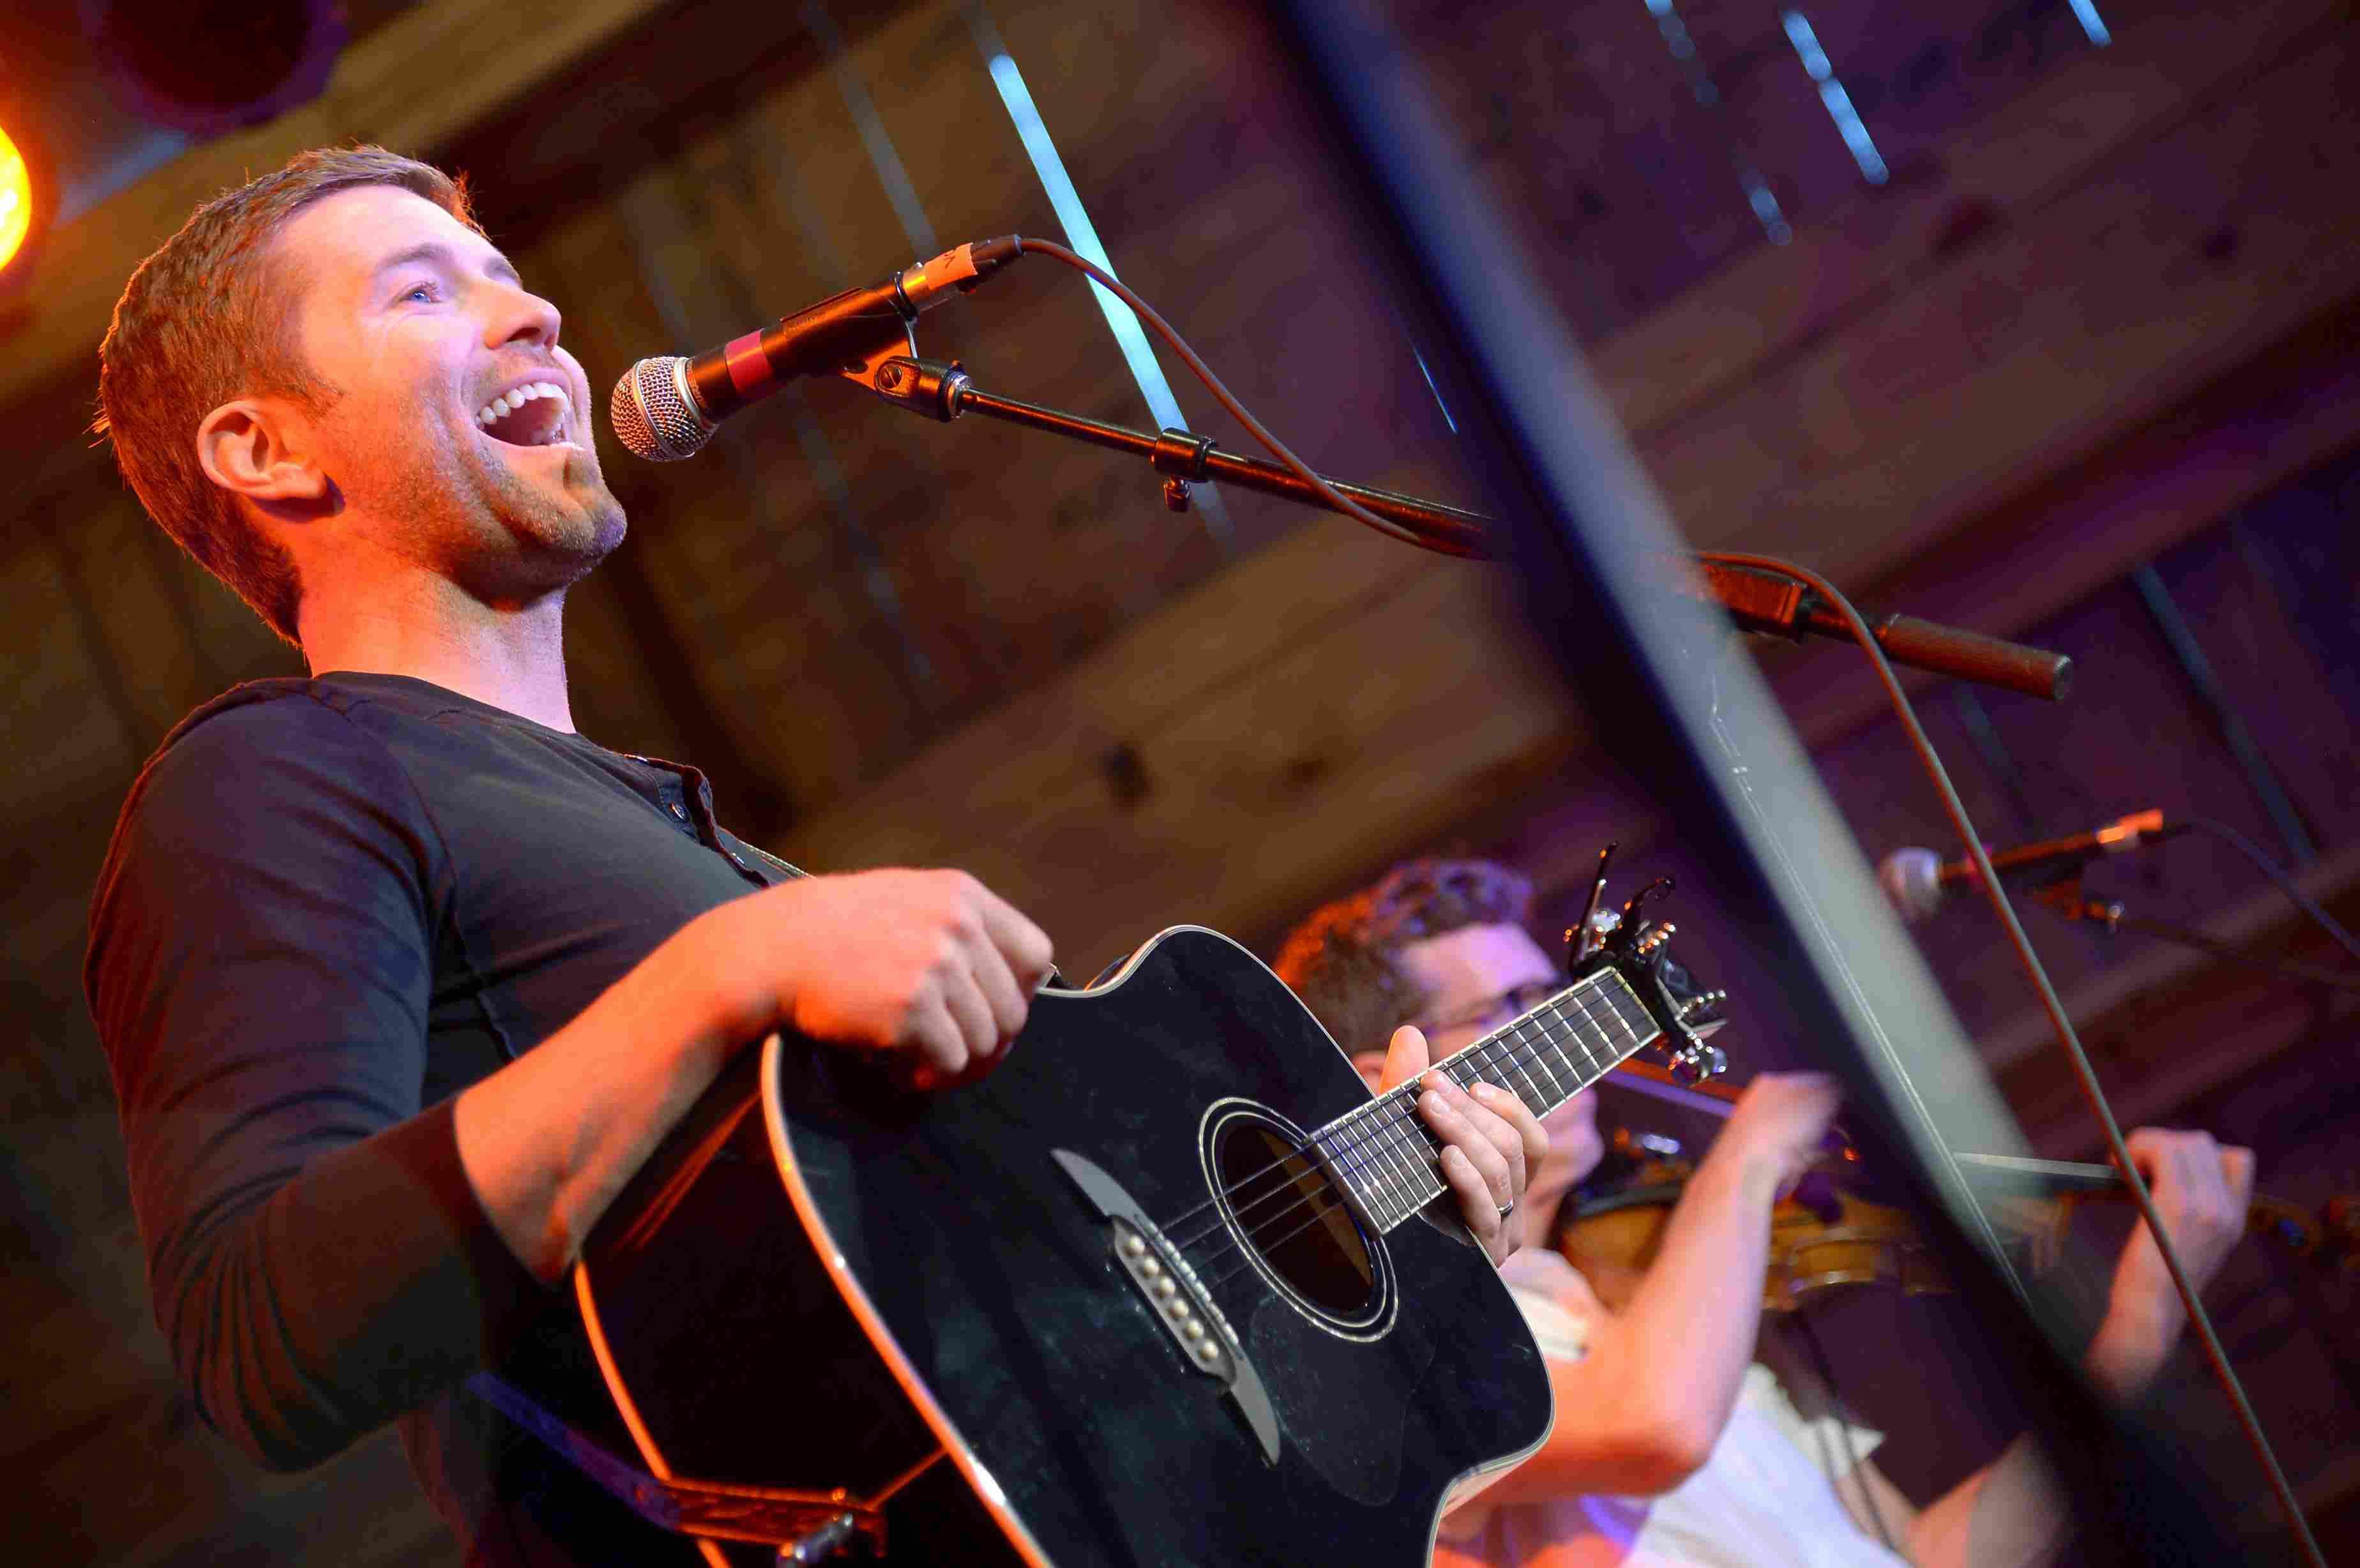 Josh Turner singing in concert